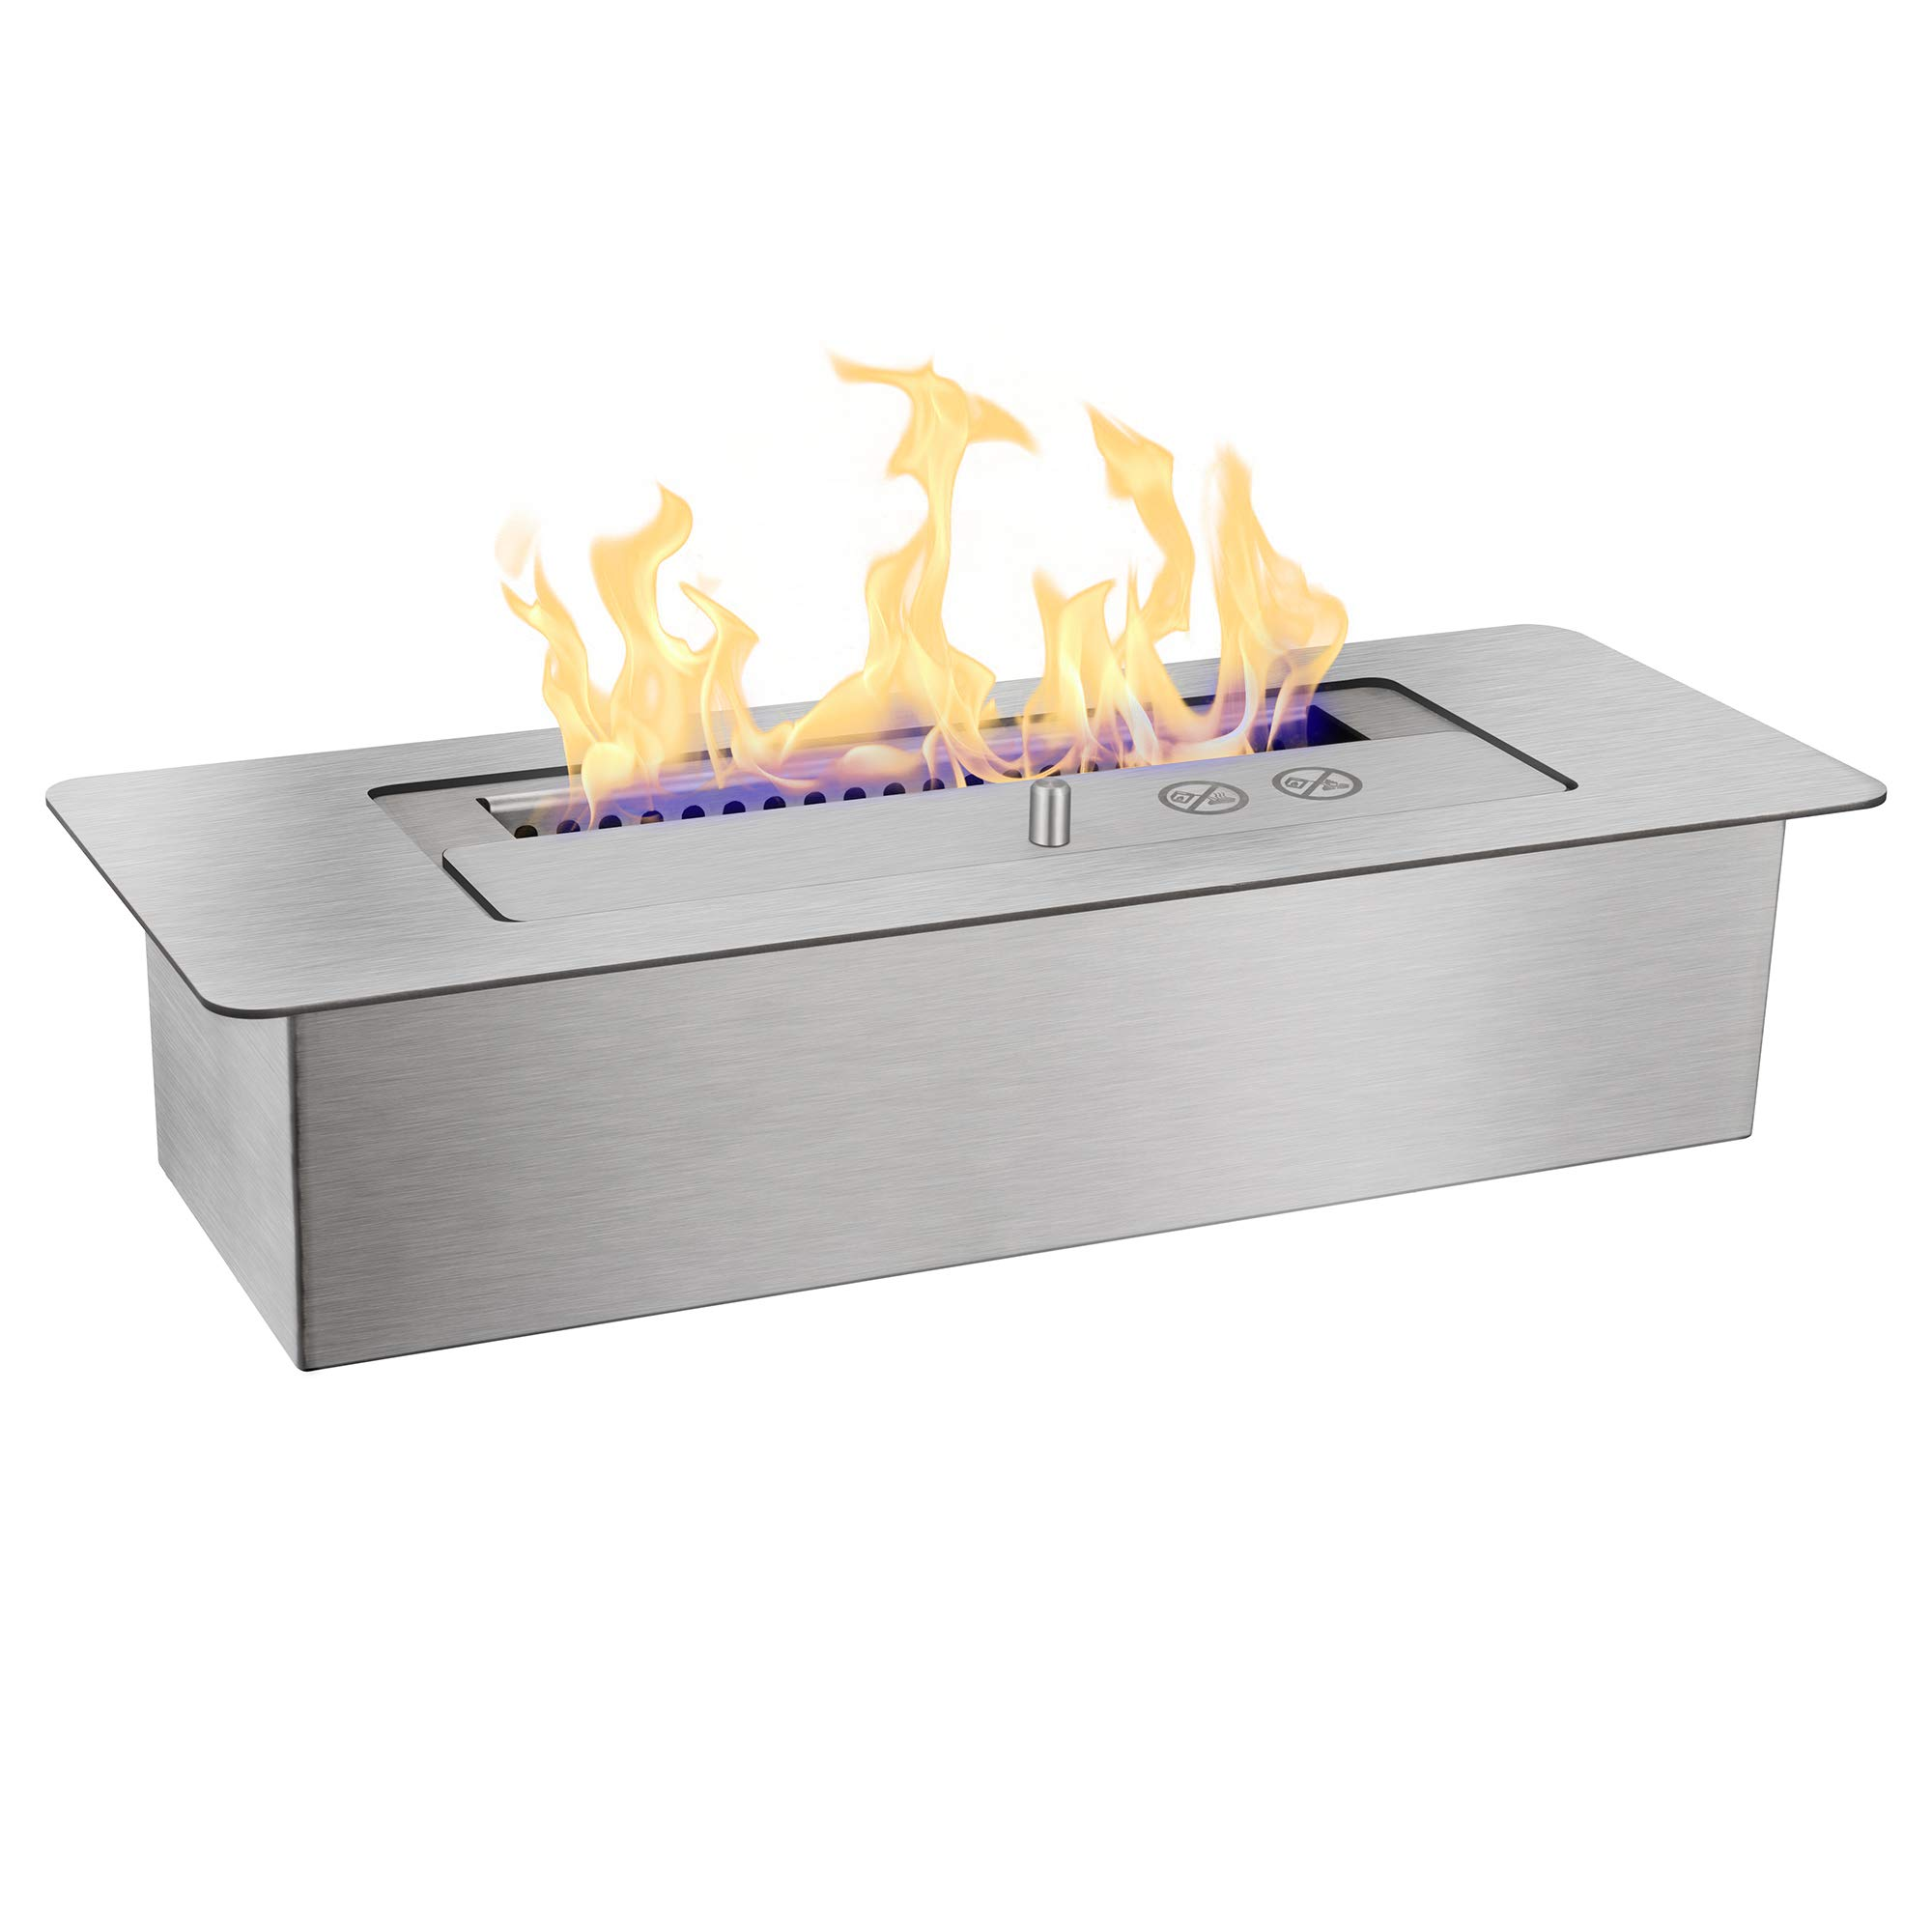 Xbeauty PRO 12 Inch Bio Ethanol Fireplace Burner Insert - 1.5 Liter by Xbeauty